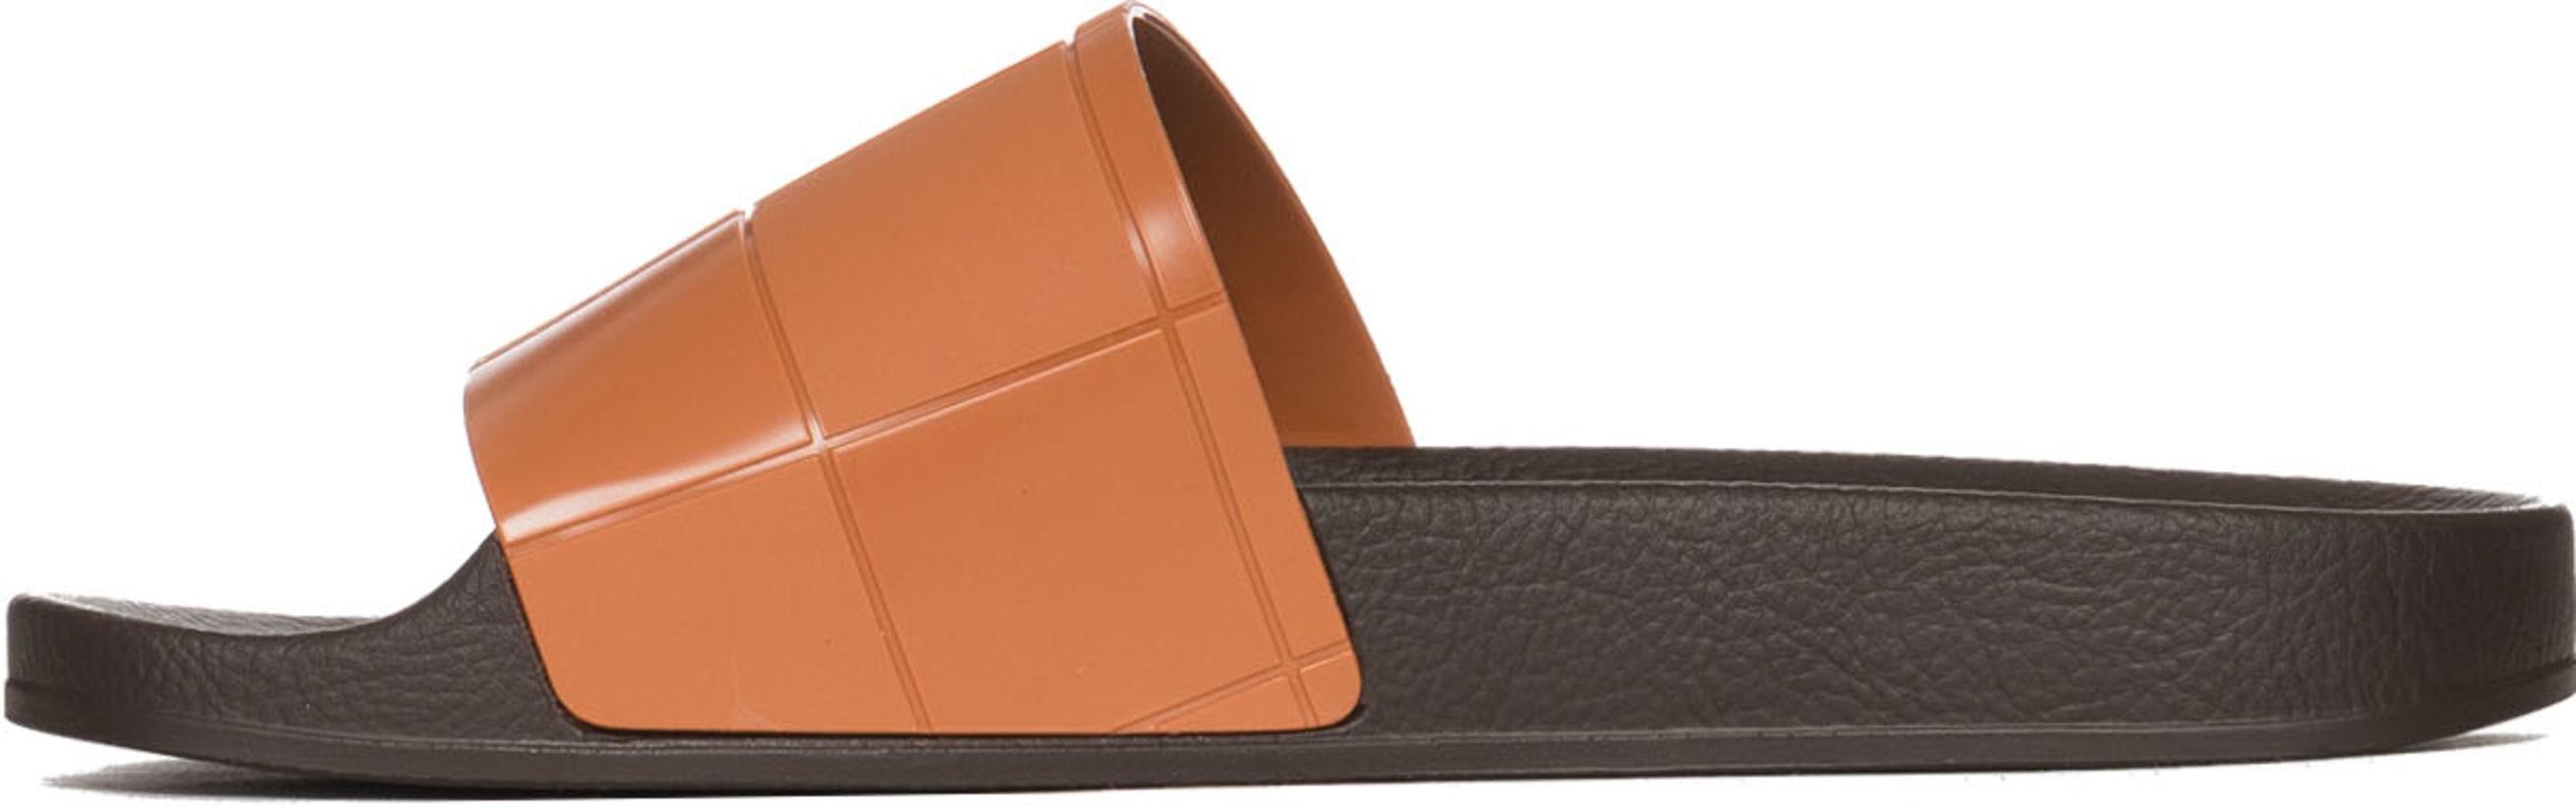 detailed look 65b00 9d228 adidas by Raf Simons  Adilette Checkerboard - Dark Brown Brown   Influence U